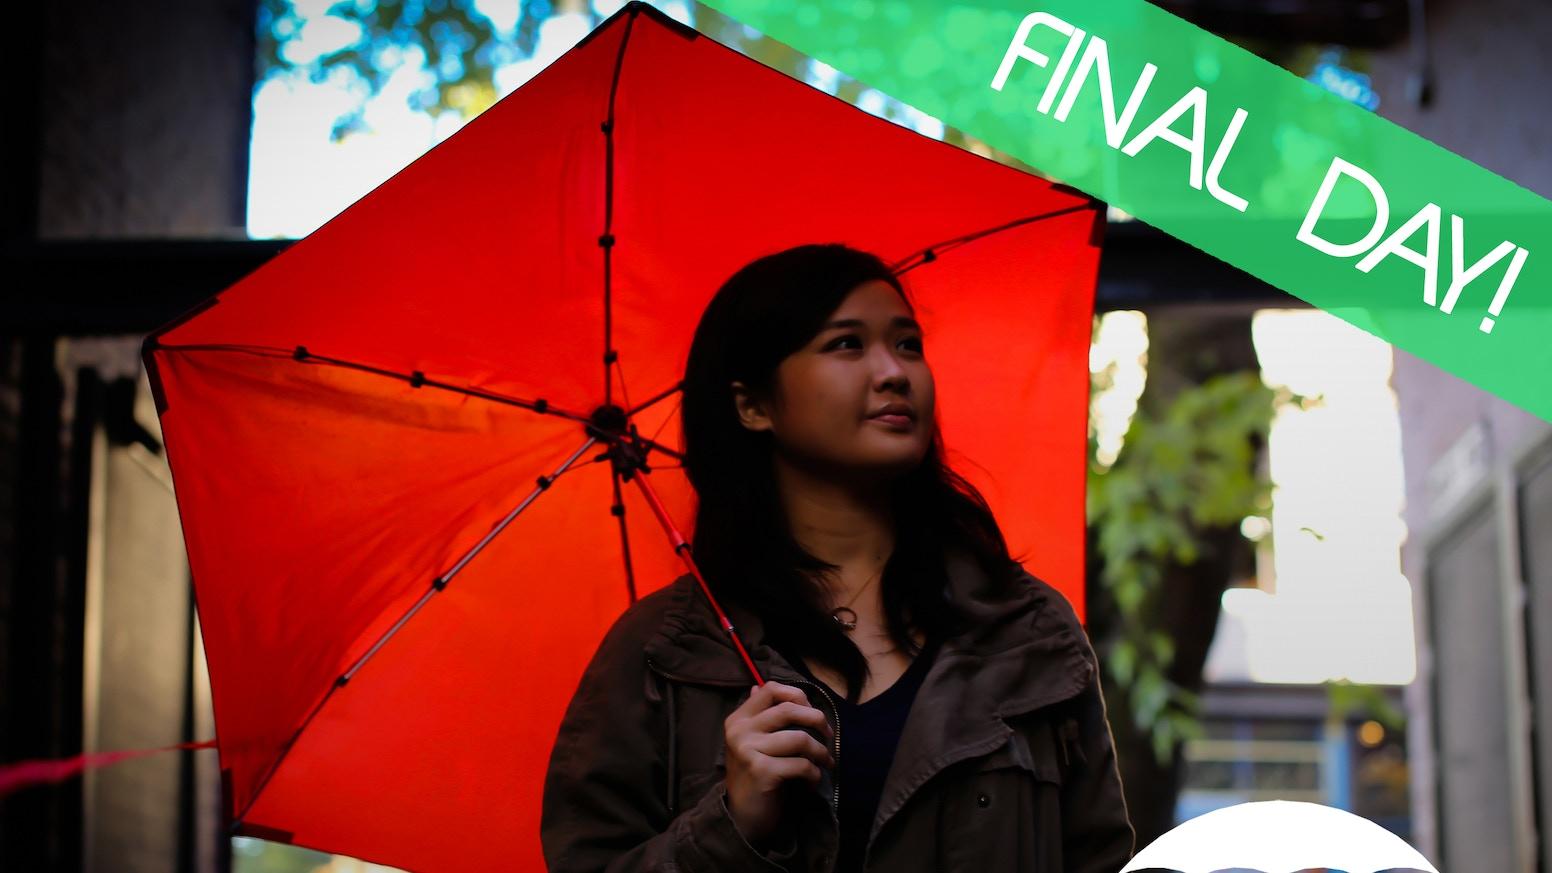 Cypress Umbrella The Last Umbrella You Will Ever Buy By